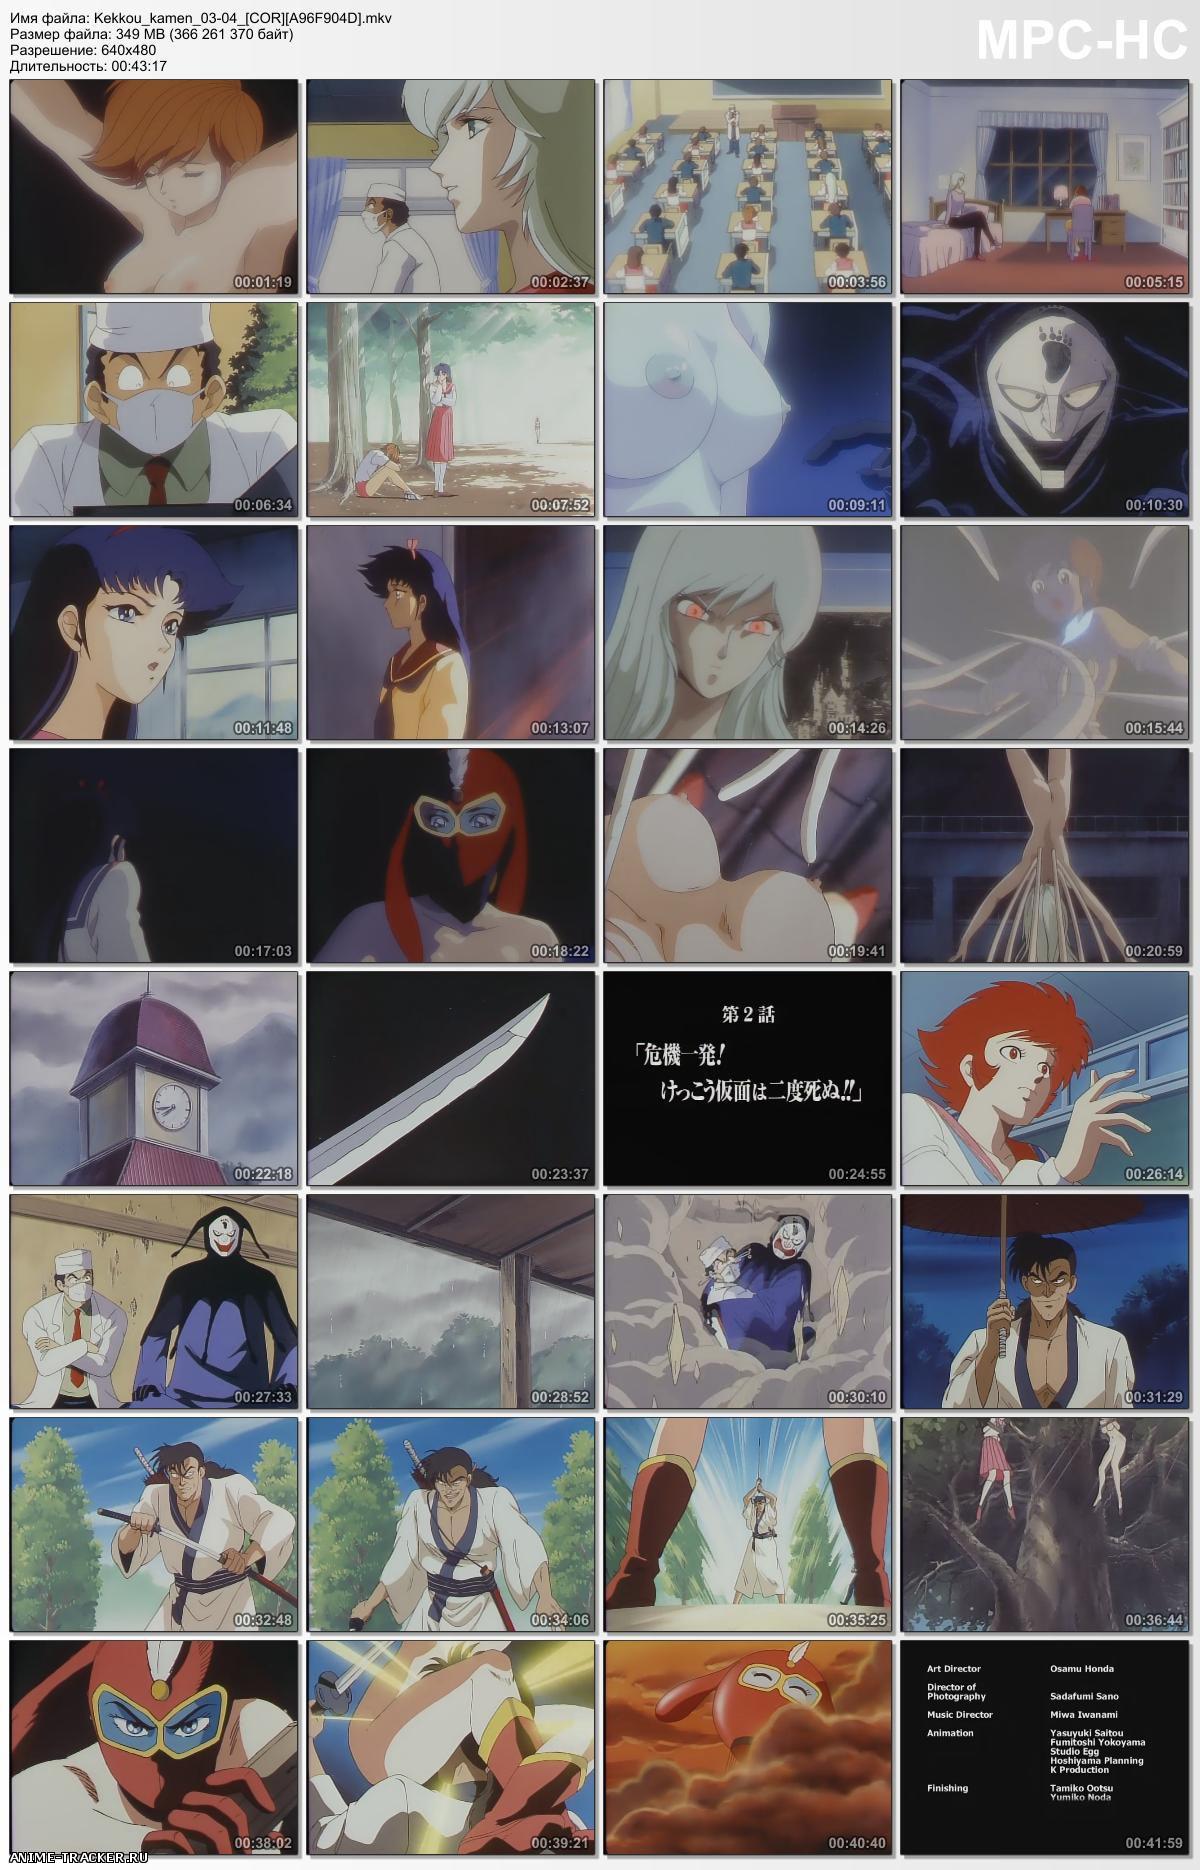 Delicious Mask / Kekkou Kamen / Kekko Kamen / Восхитительная маска [4 из 4] [ENG,JAP,RUS] Anime Hentai